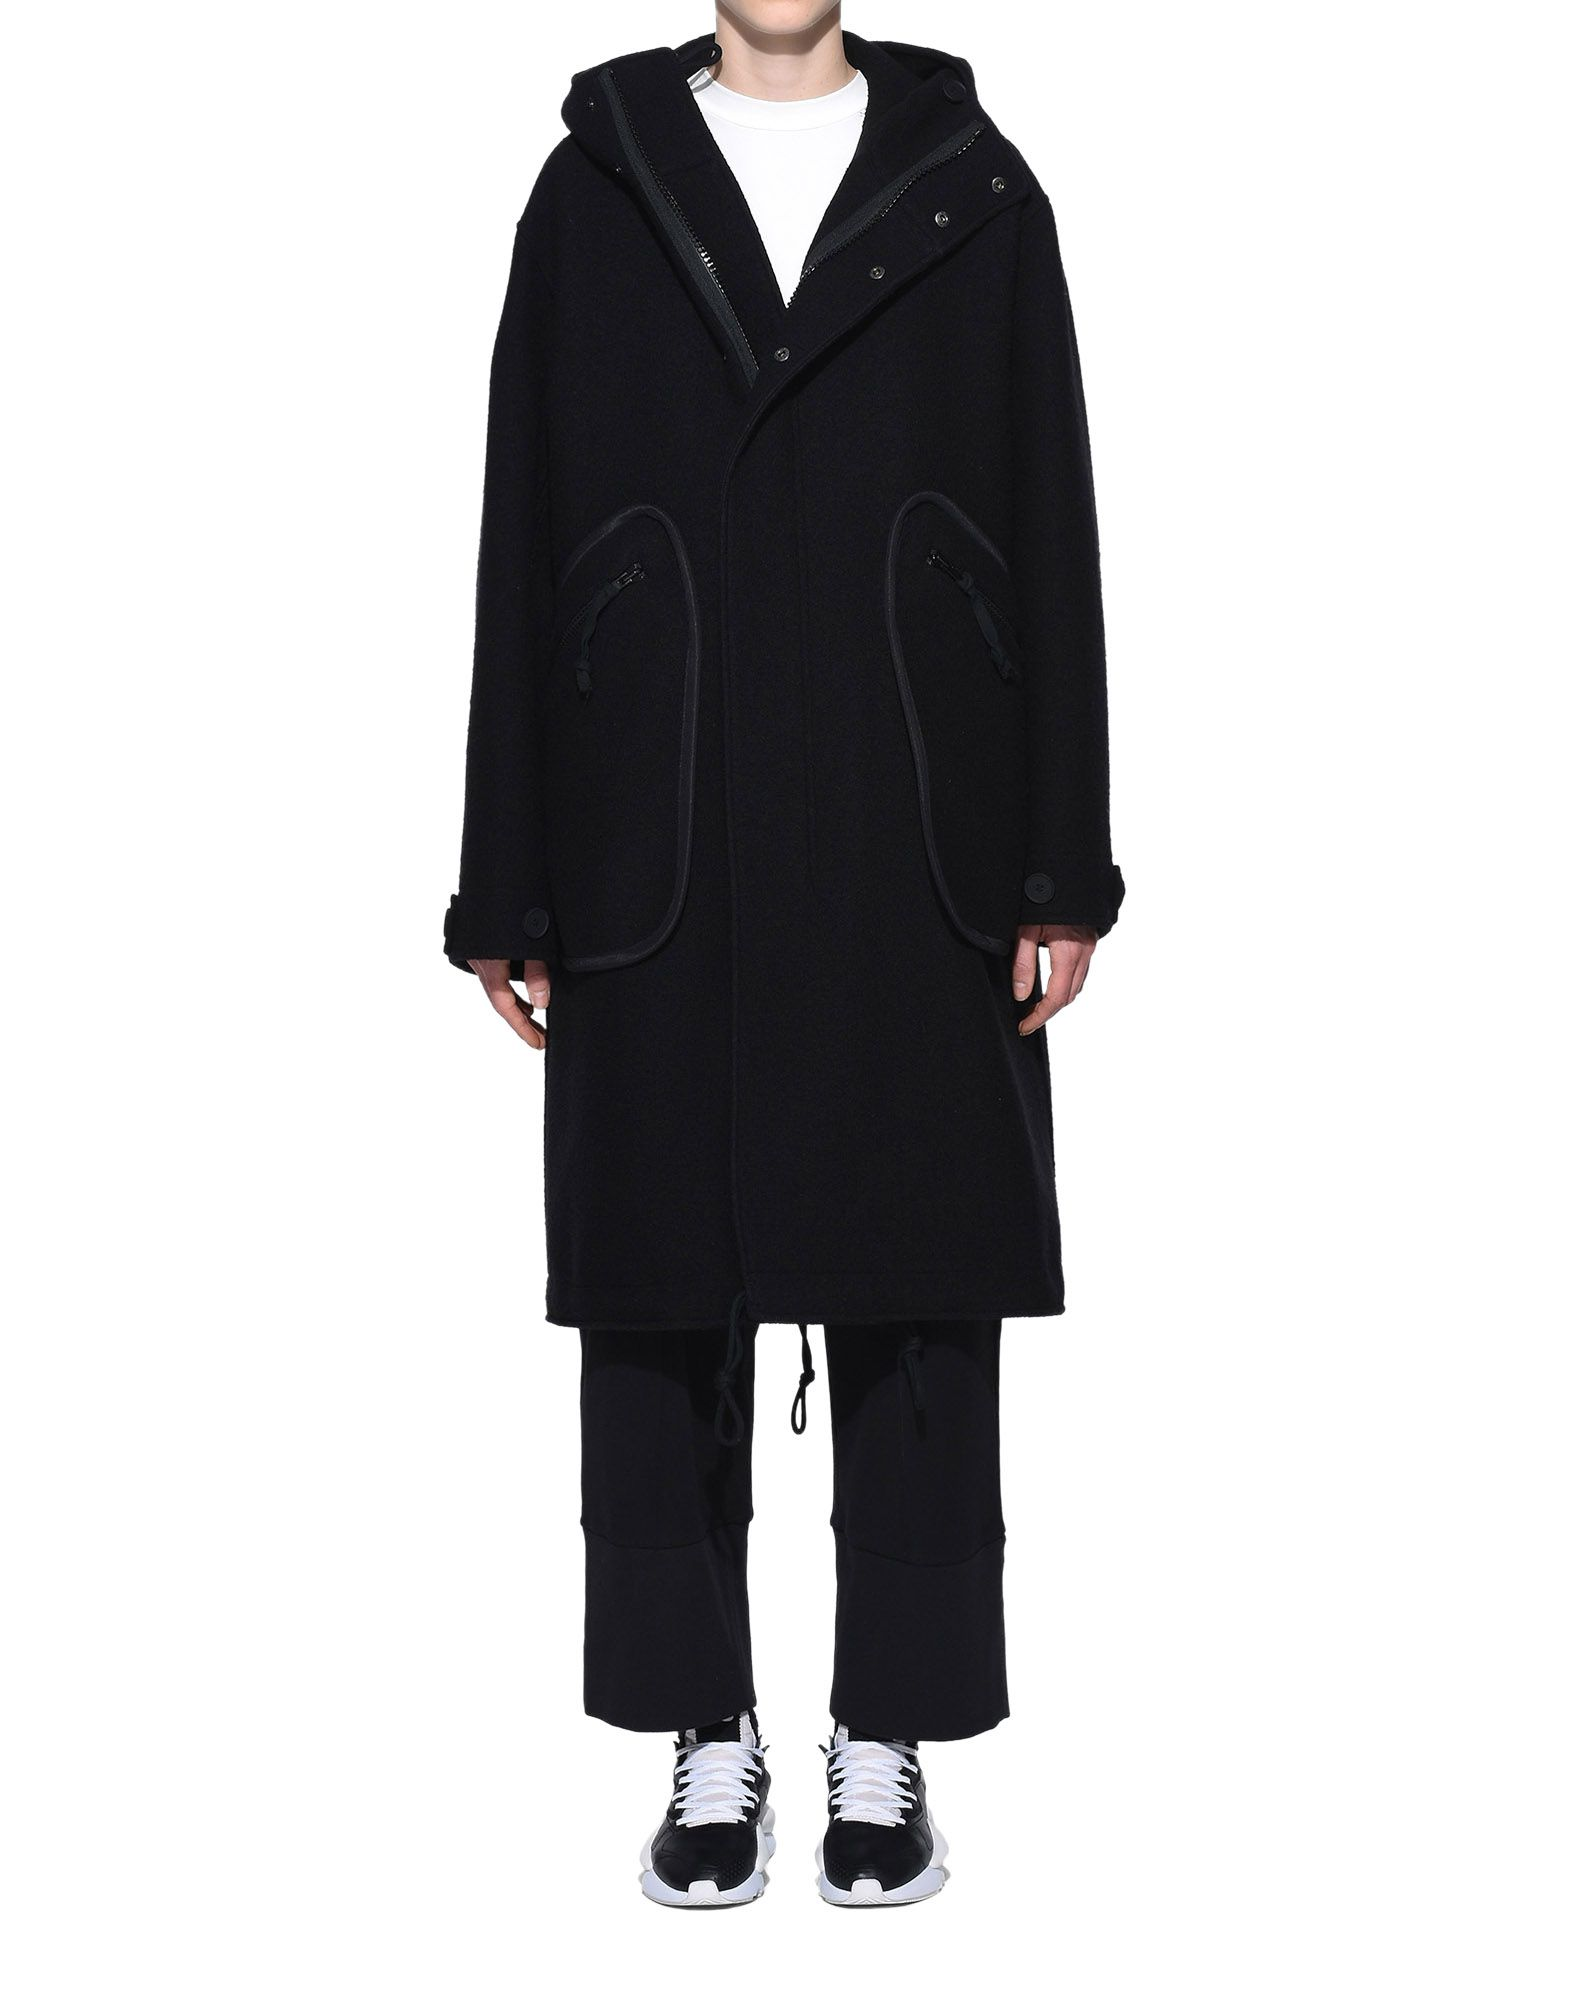 Y-3 Y-3 Reversible Wool Parka Coat Woman r